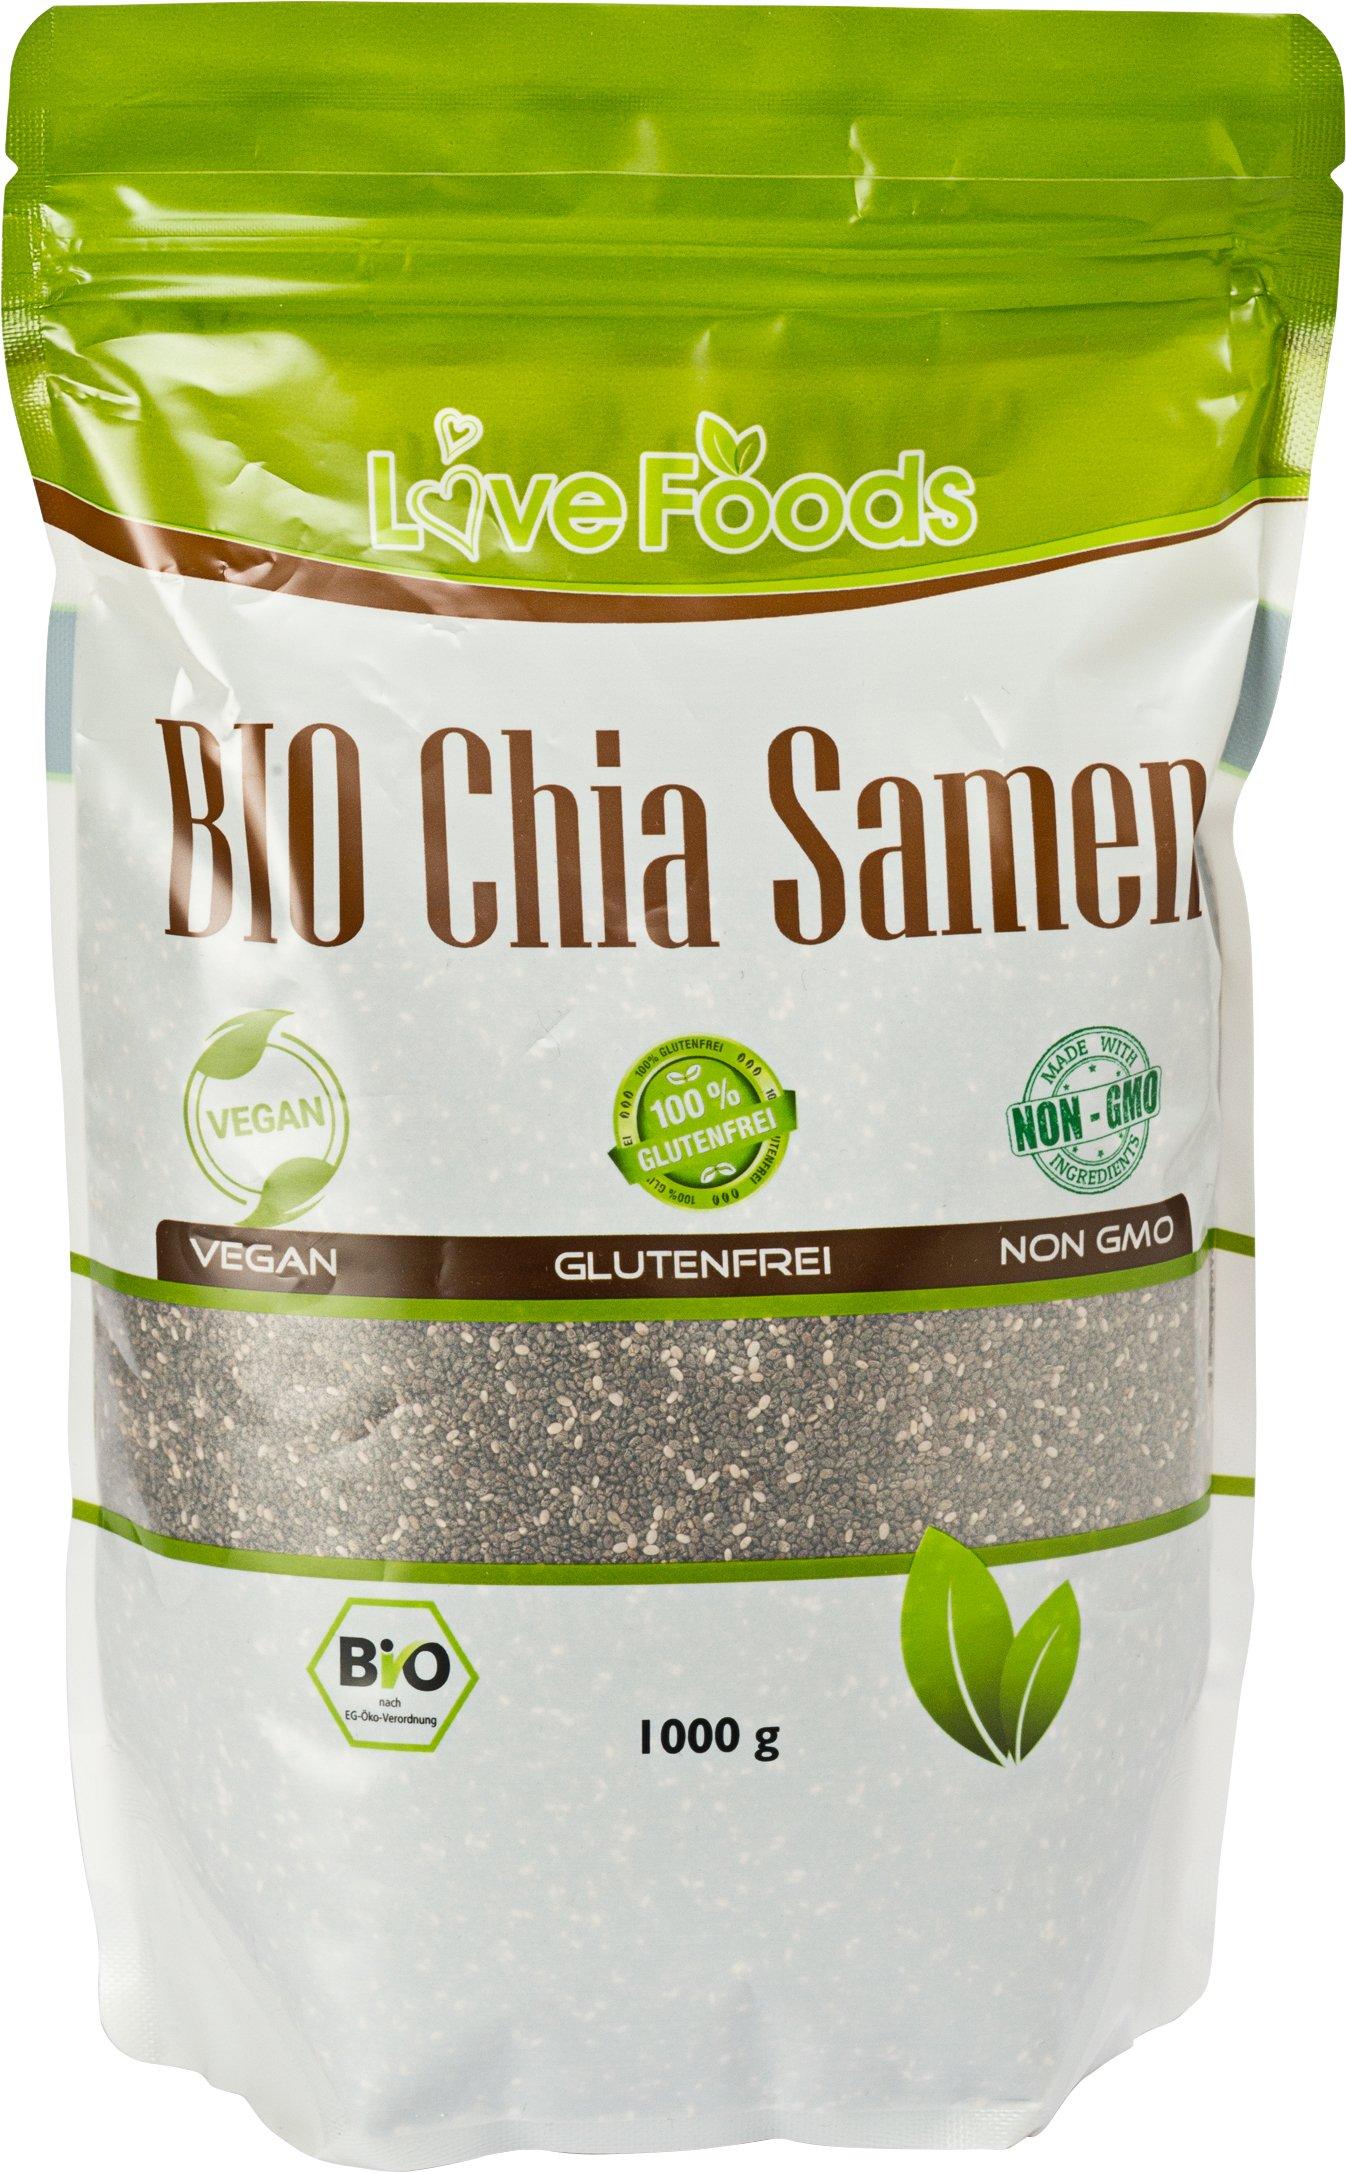 BIO Chia Samen BIO - 1000 g - Chiasamen 1kg - DE-ÖKO-039 - Love Foods - Bonus: Inklusiv Rezepte-eBook product image